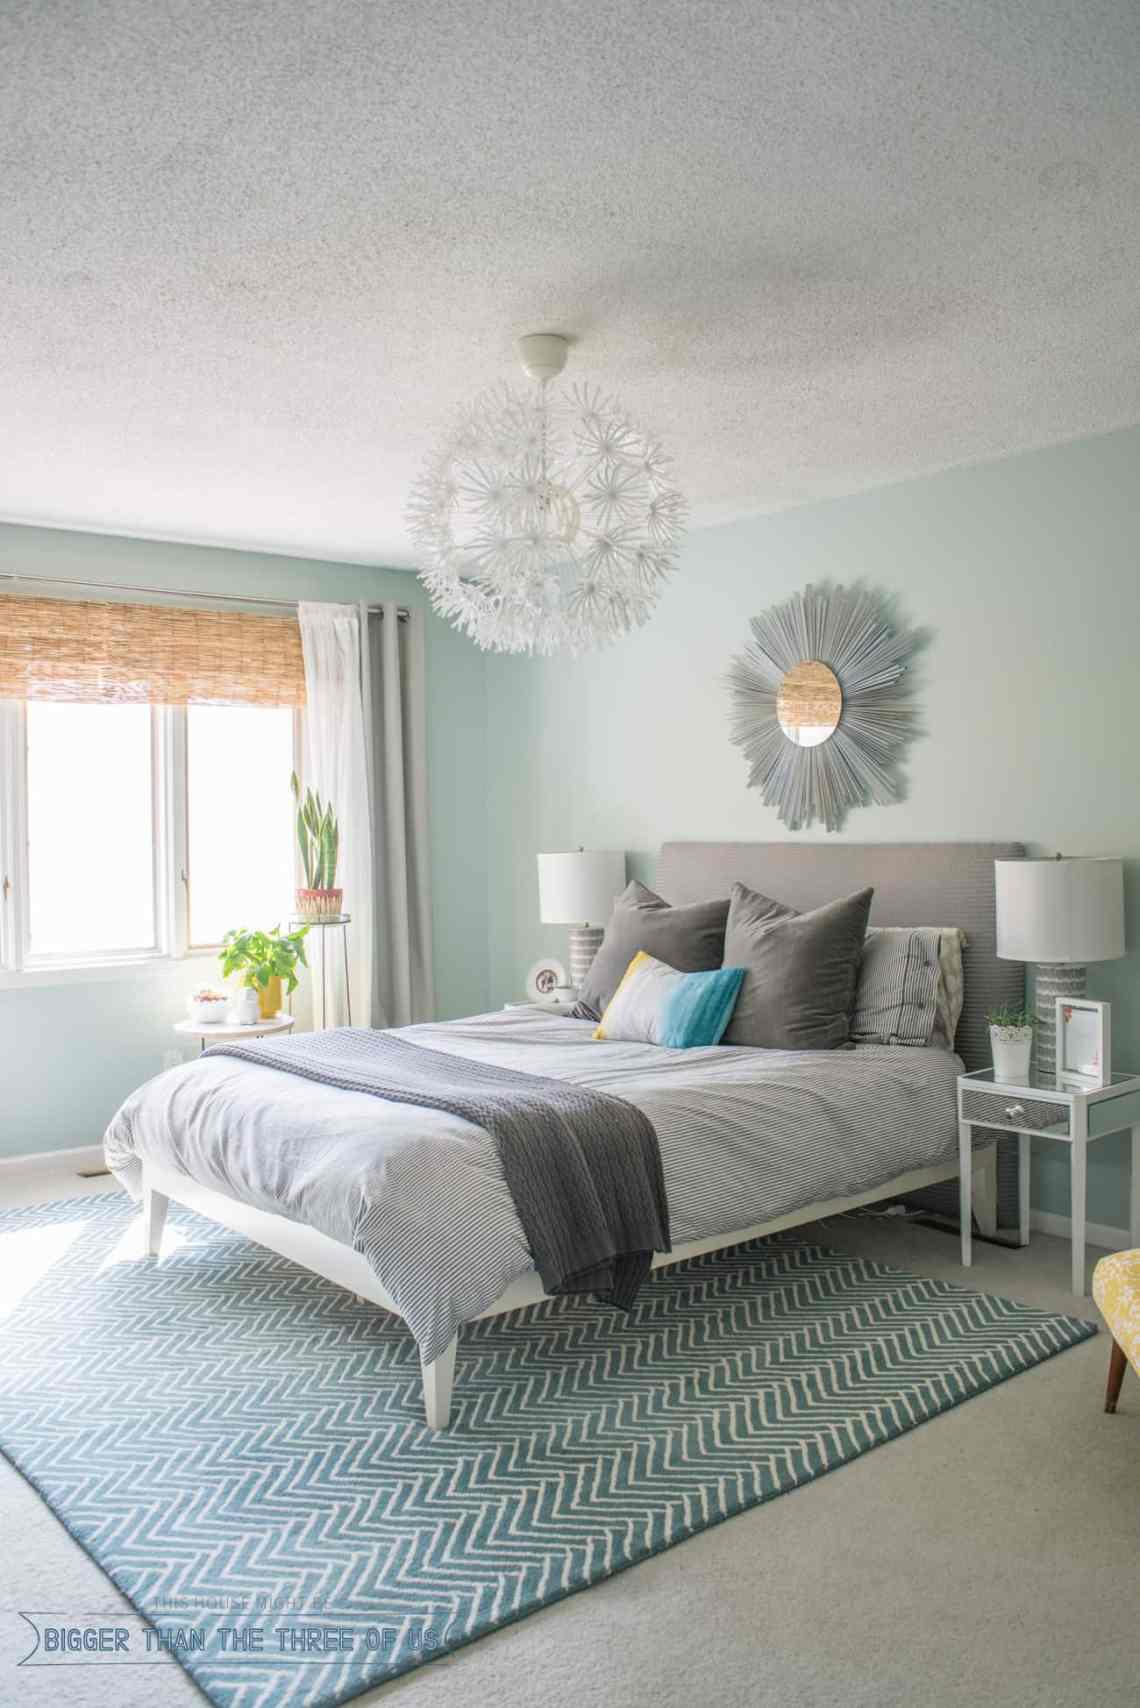 Dreamy Bohemian Bedroom Design - Bigger Than the Three of Us